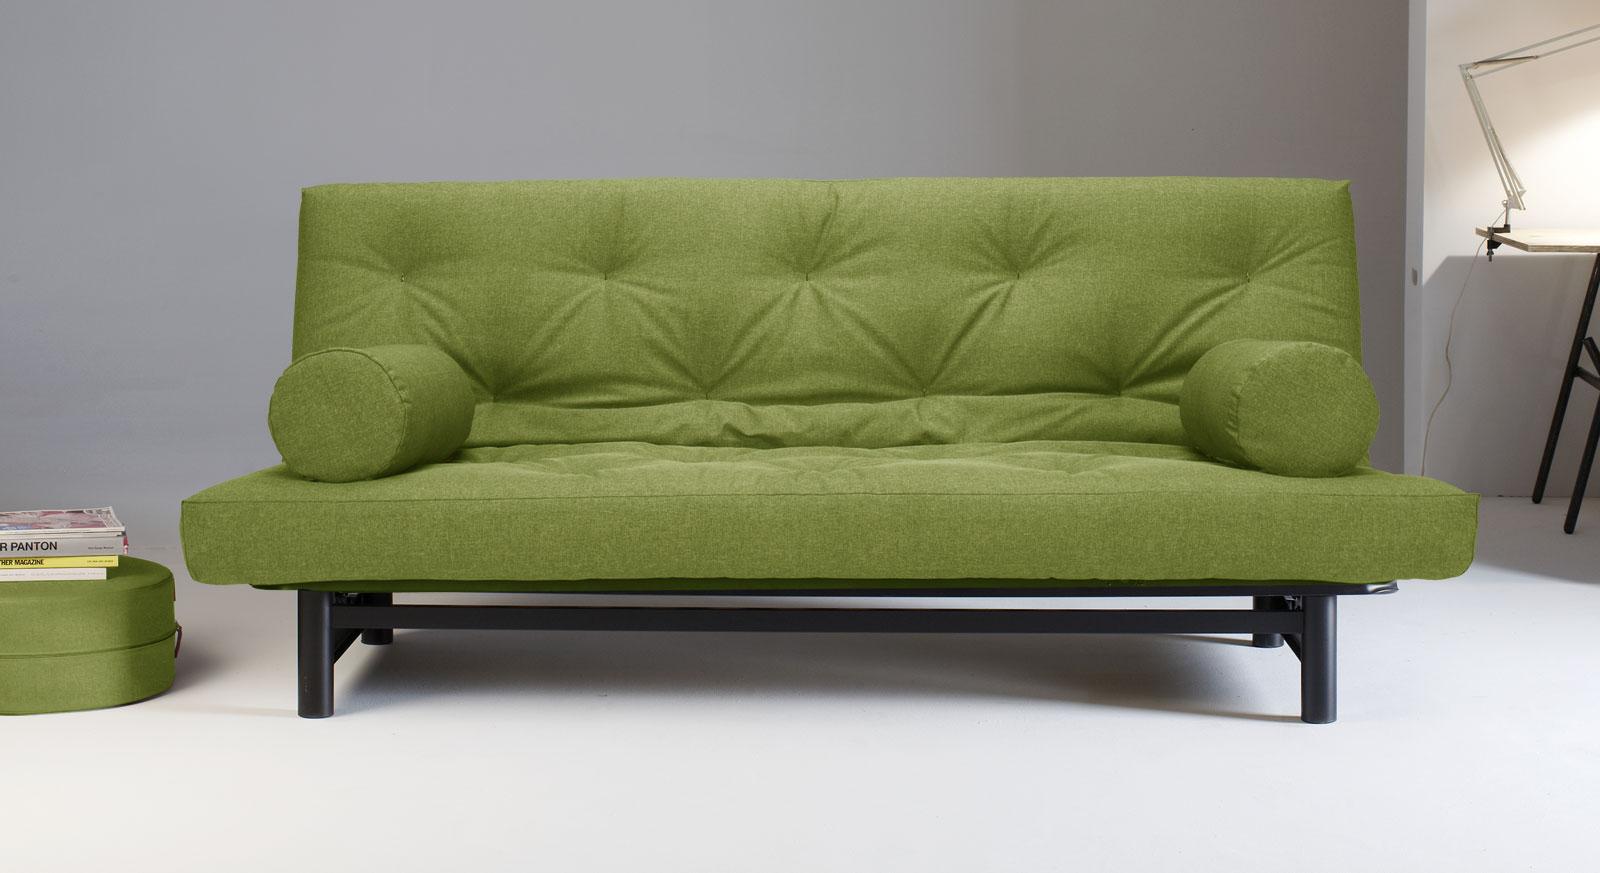 schlafsofa jede nacht es geht um idee. Black Bedroom Furniture Sets. Home Design Ideas